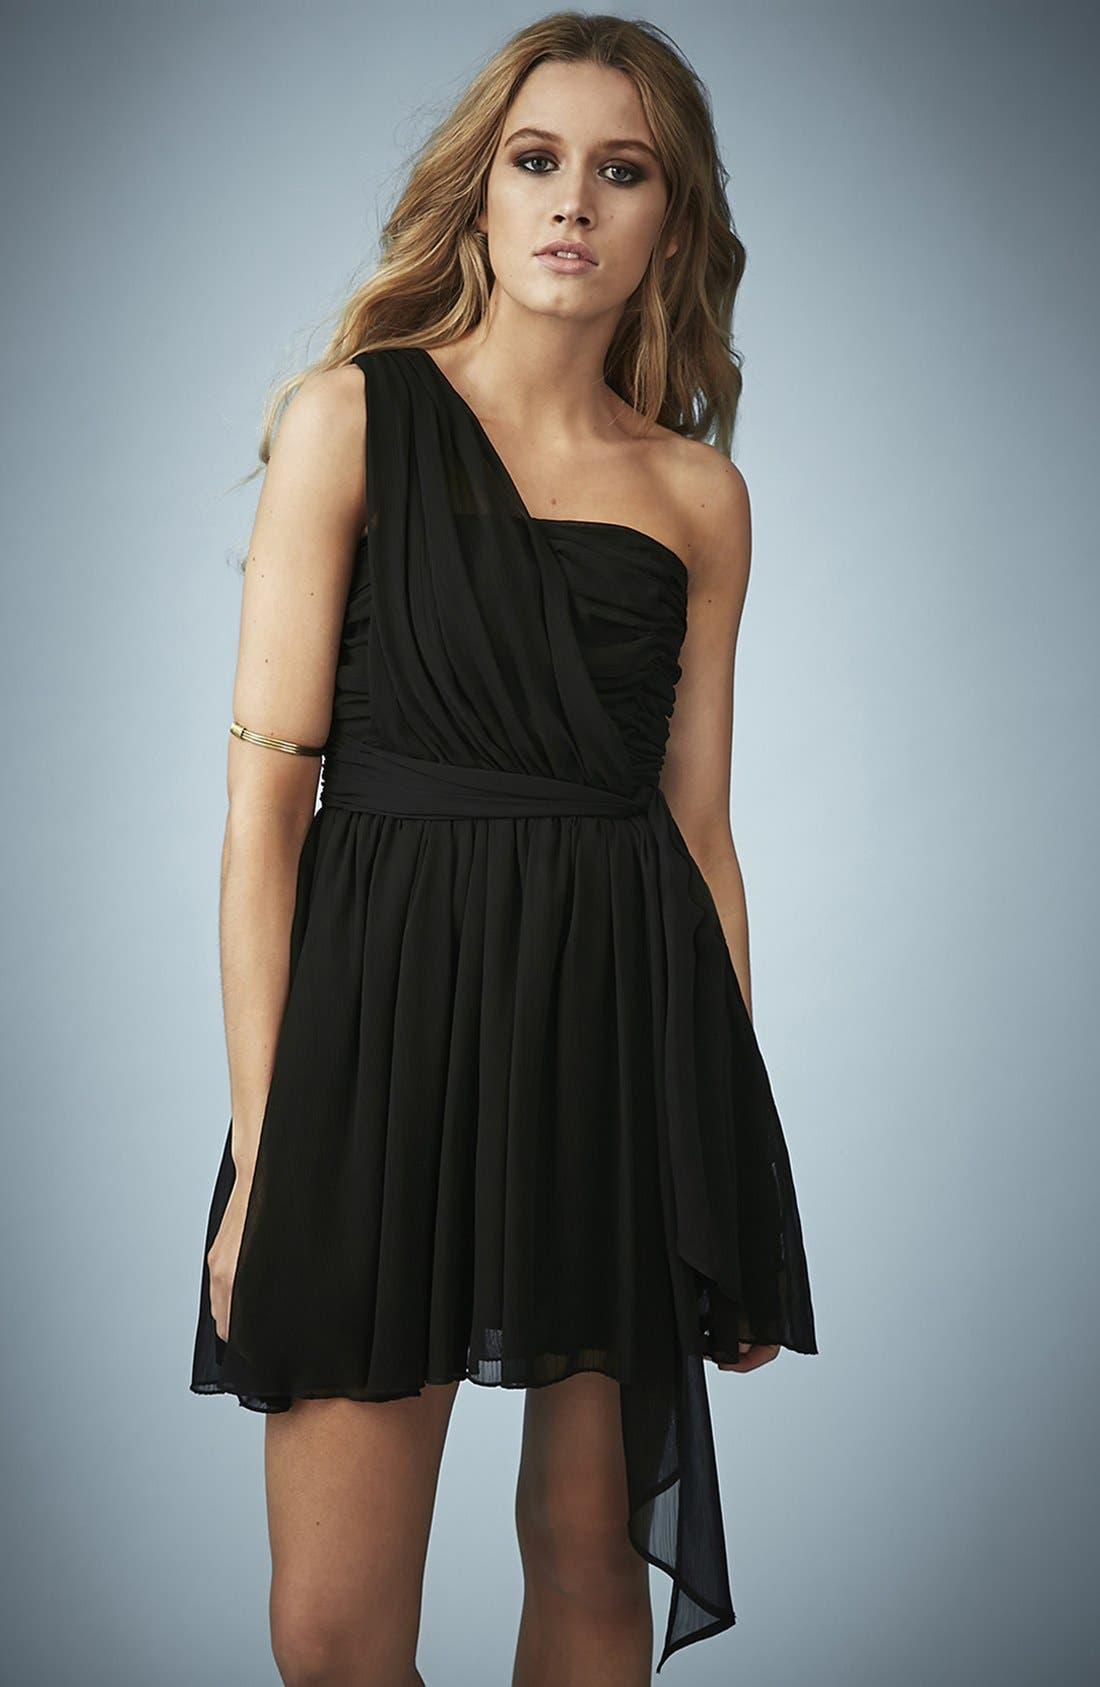 TOPSHOP, Kate Moss for Topshop One-Shoulder Chiffon Dress, Main thumbnail 1, color, 001